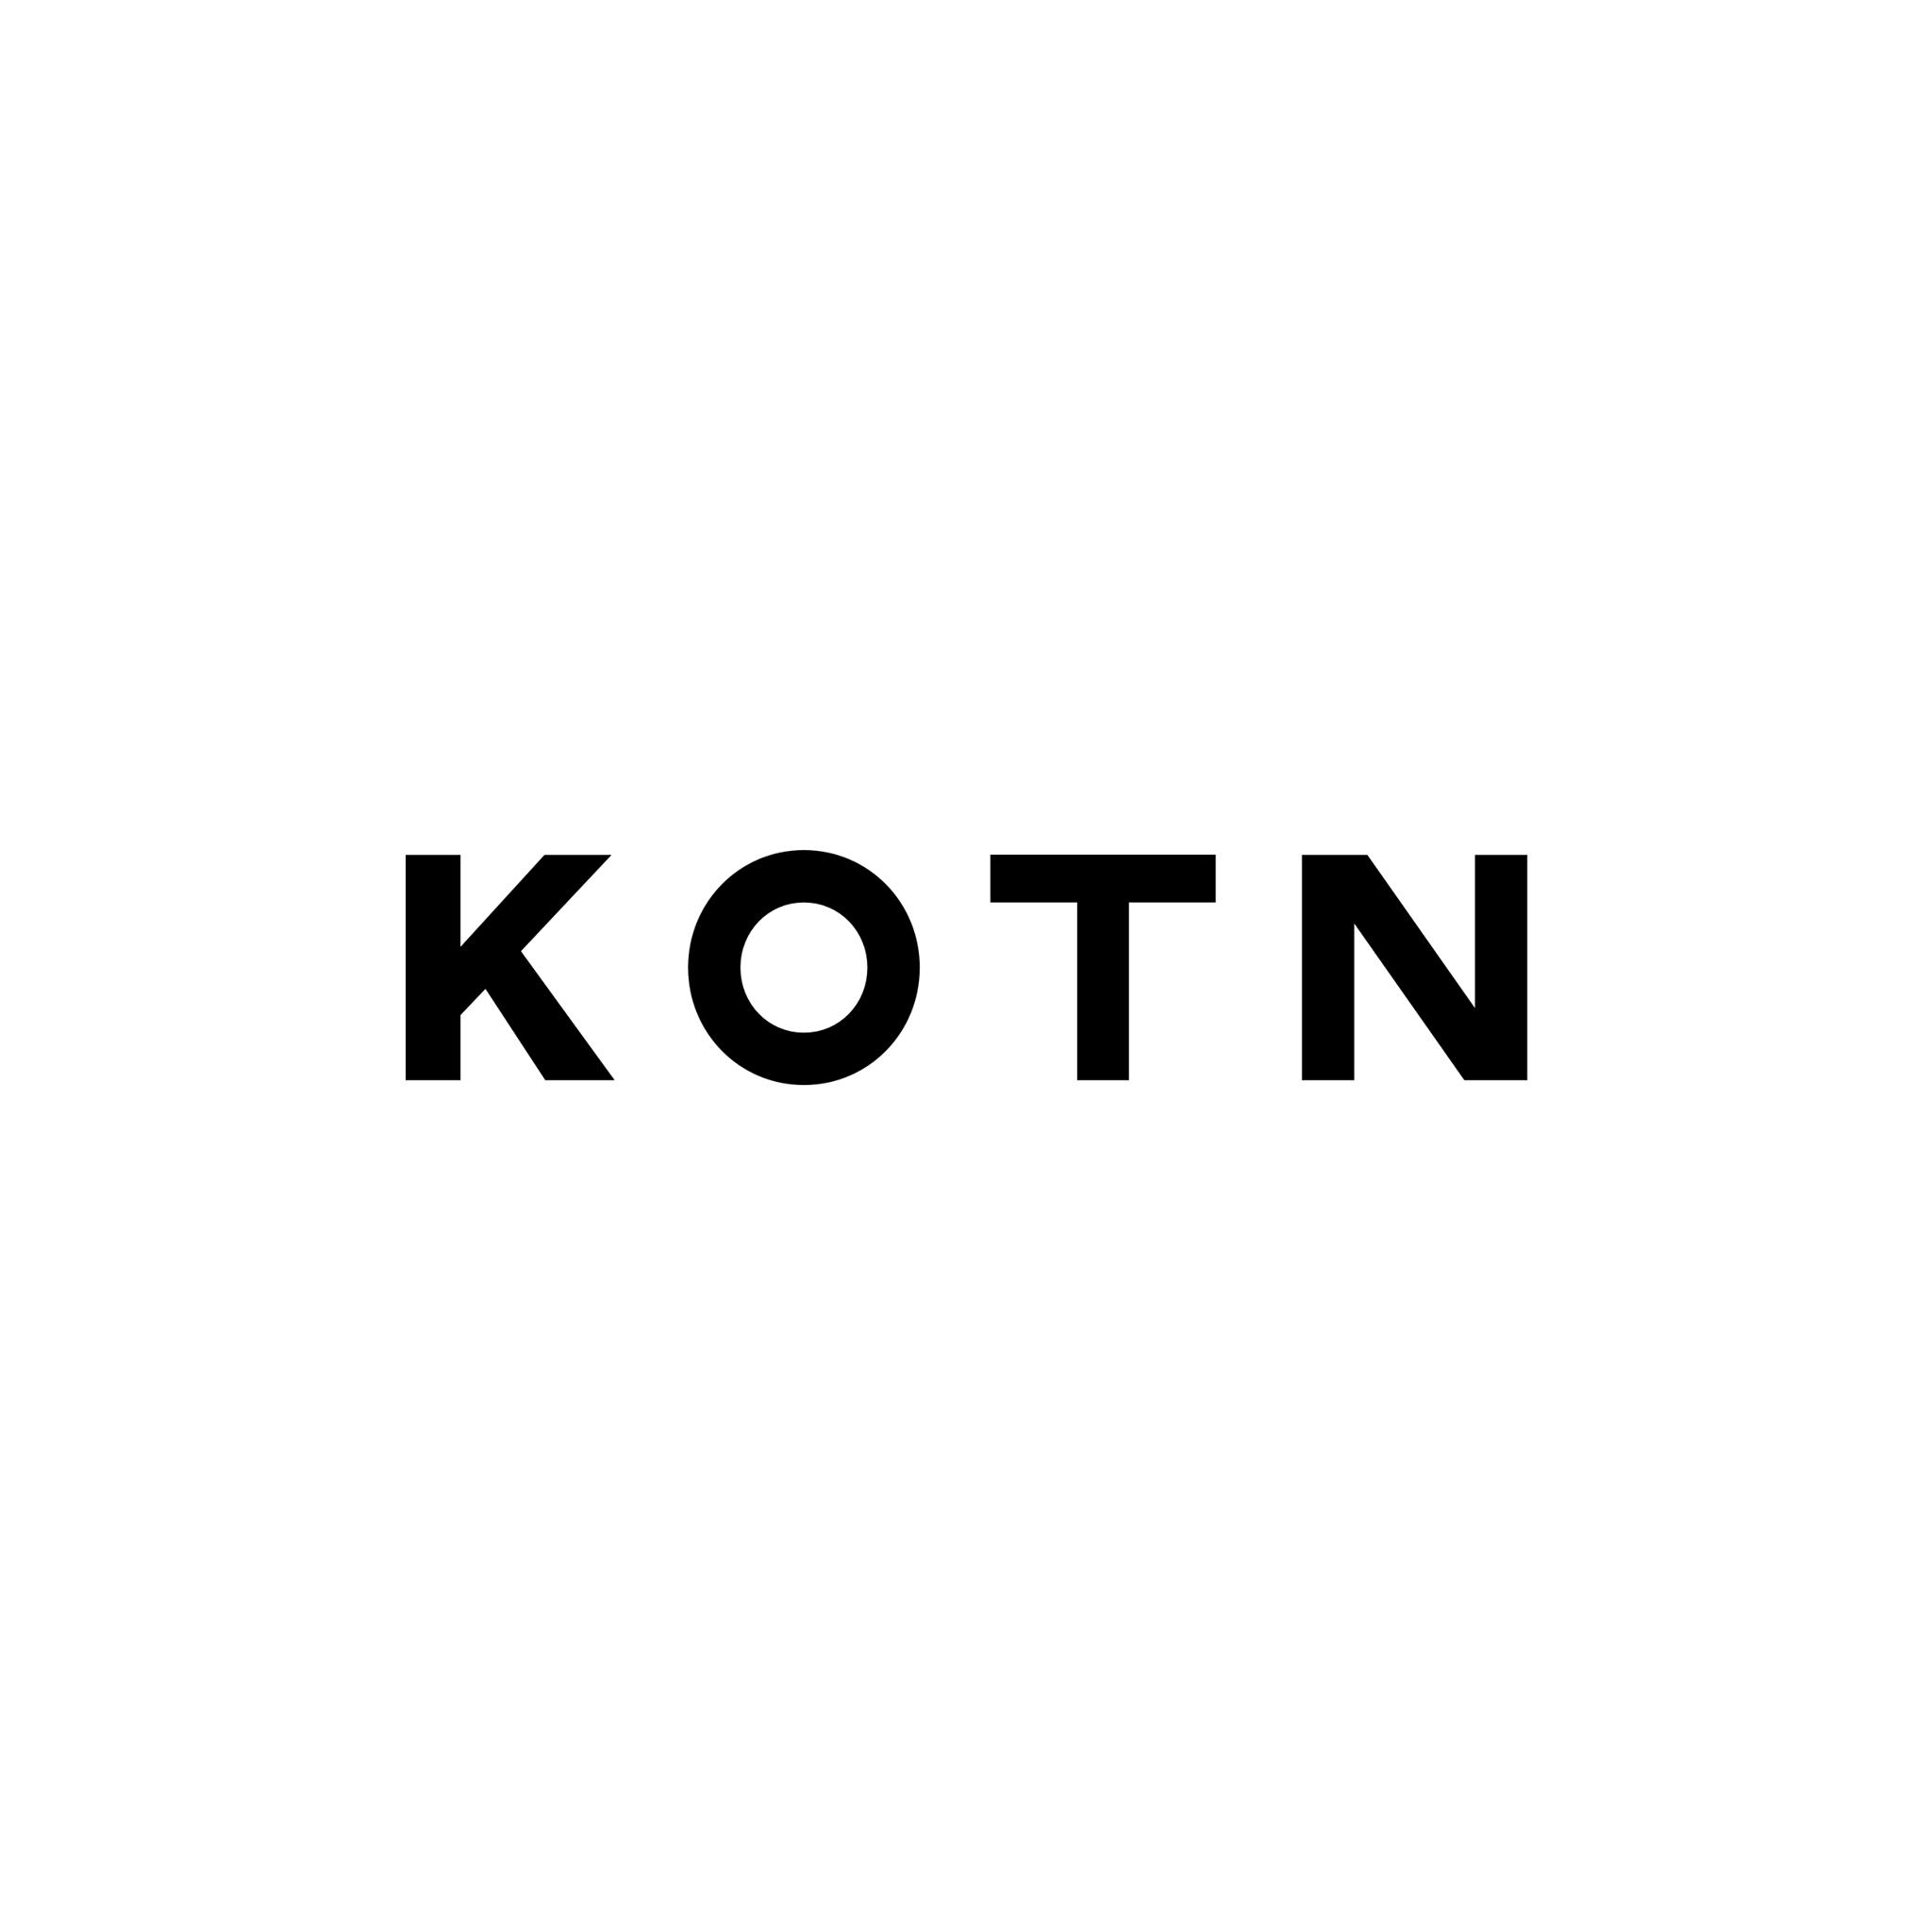 Kotn, organic clothing, apparel, sustainable